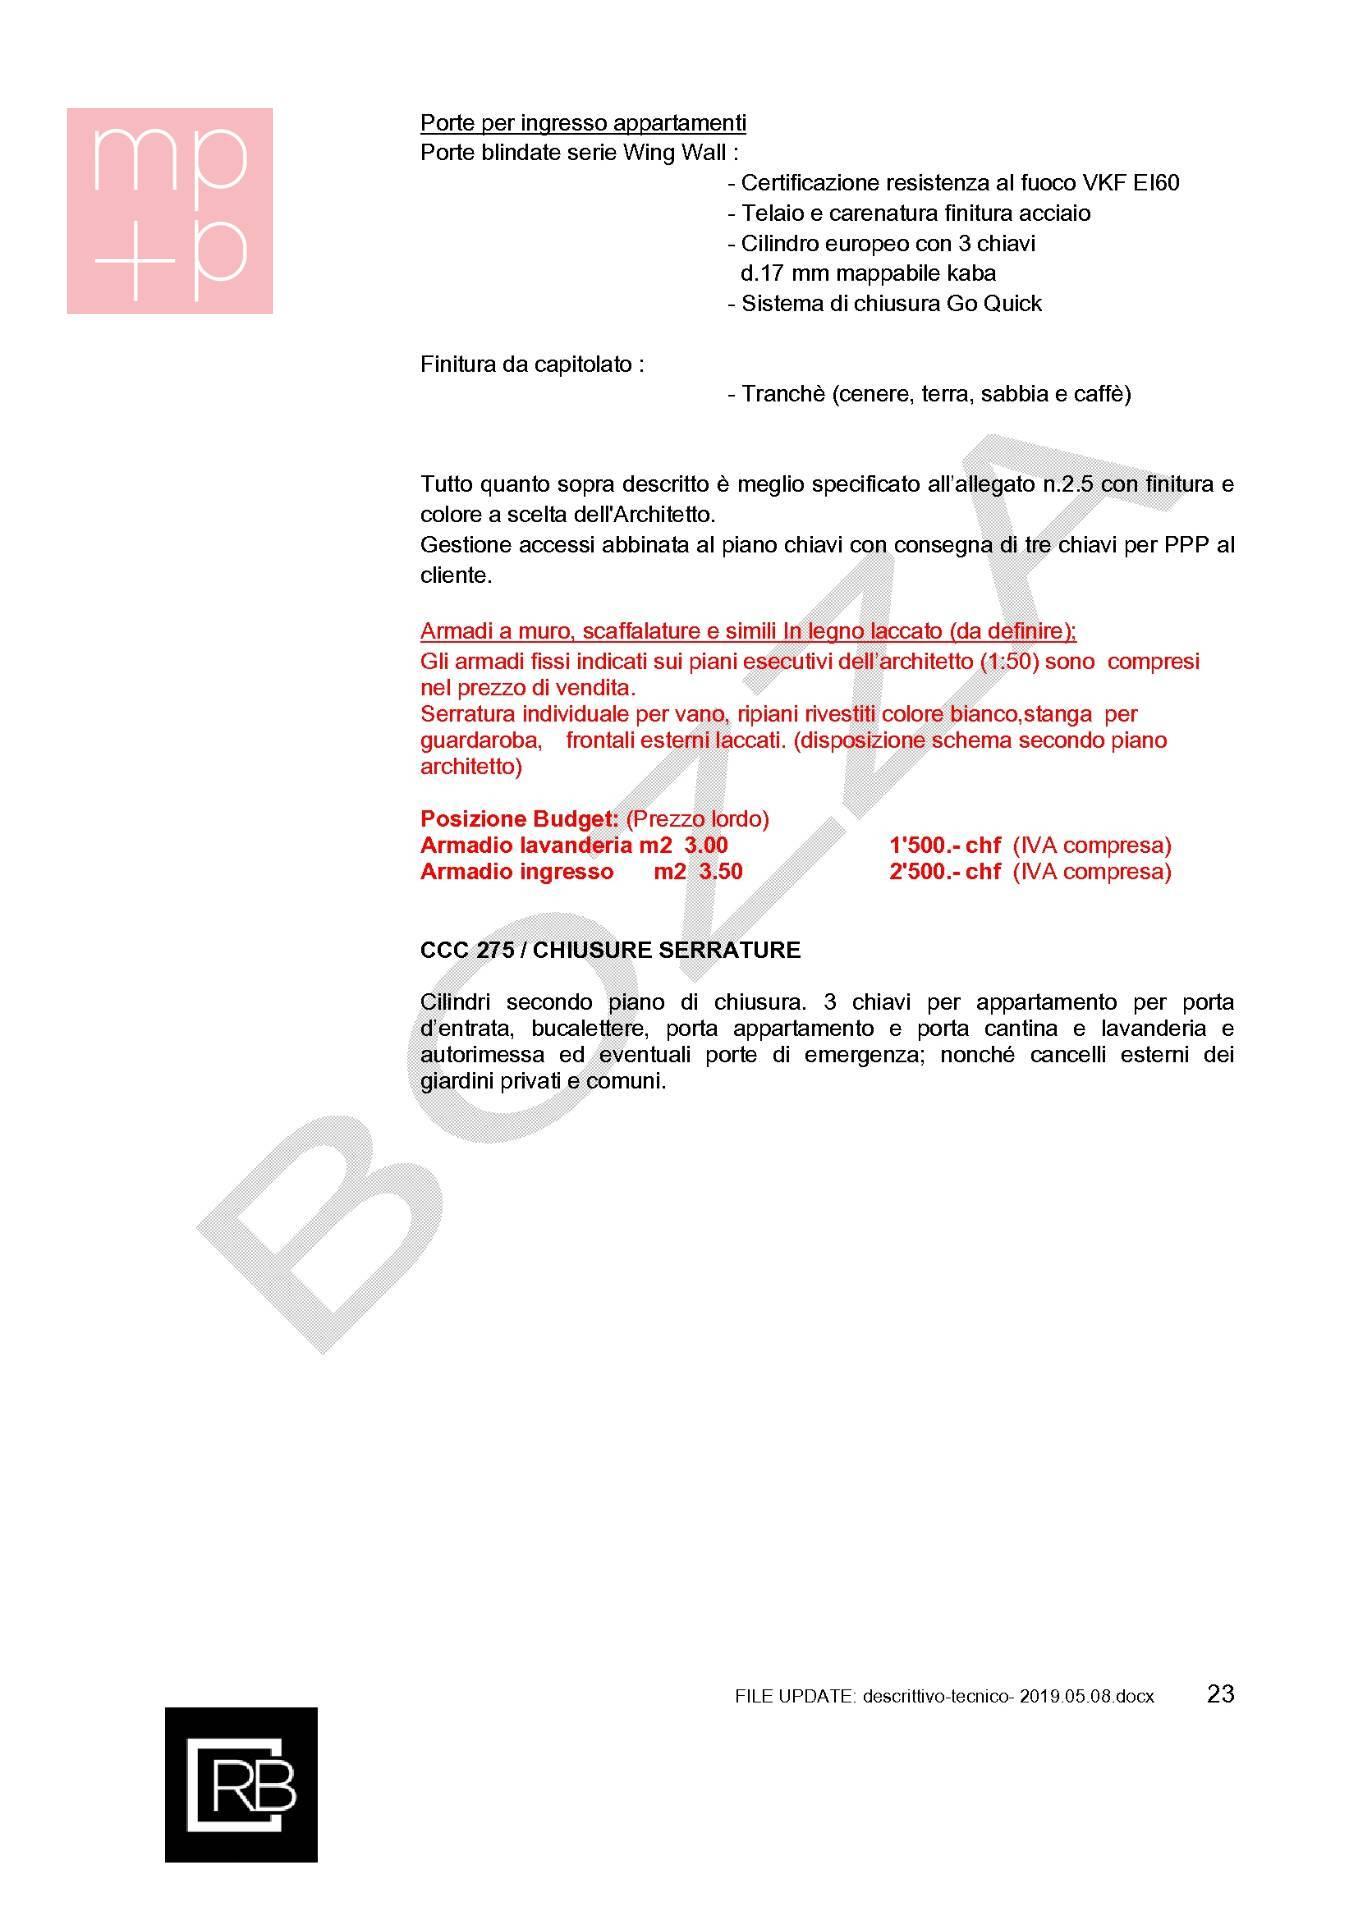 MPP Fiduciaria SA